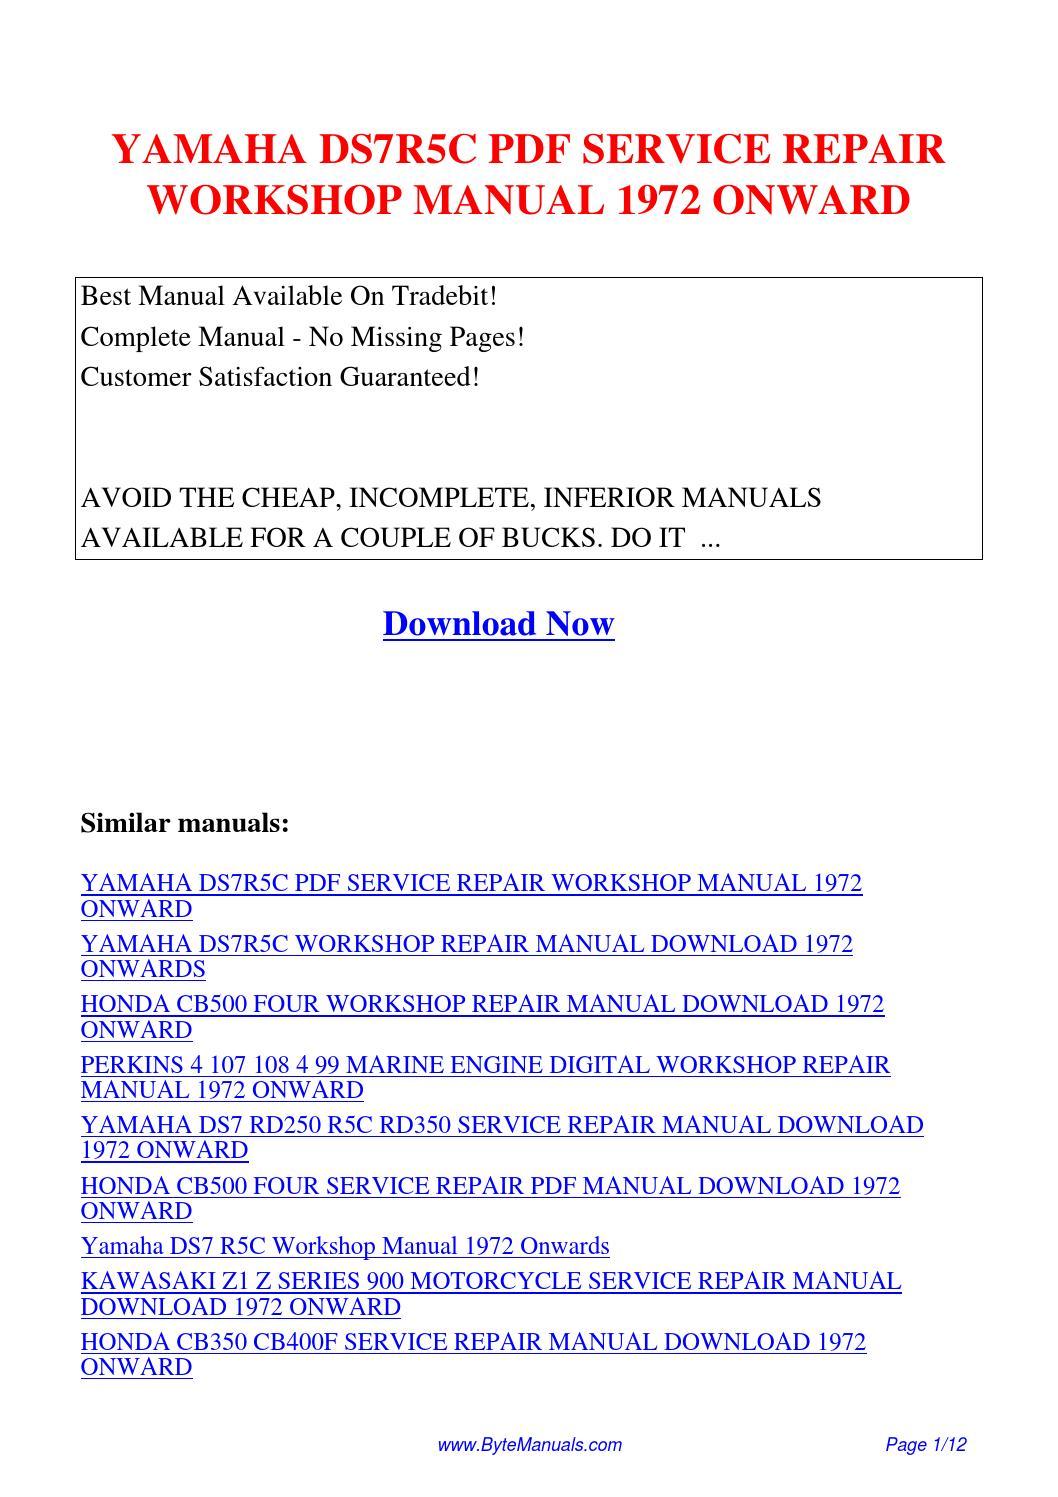 YAMAHA DS7R5C SERVICE REPAIR WORKSHOP MANUAL 1972 ONWARD.pdf by Ging Tang -  issuu